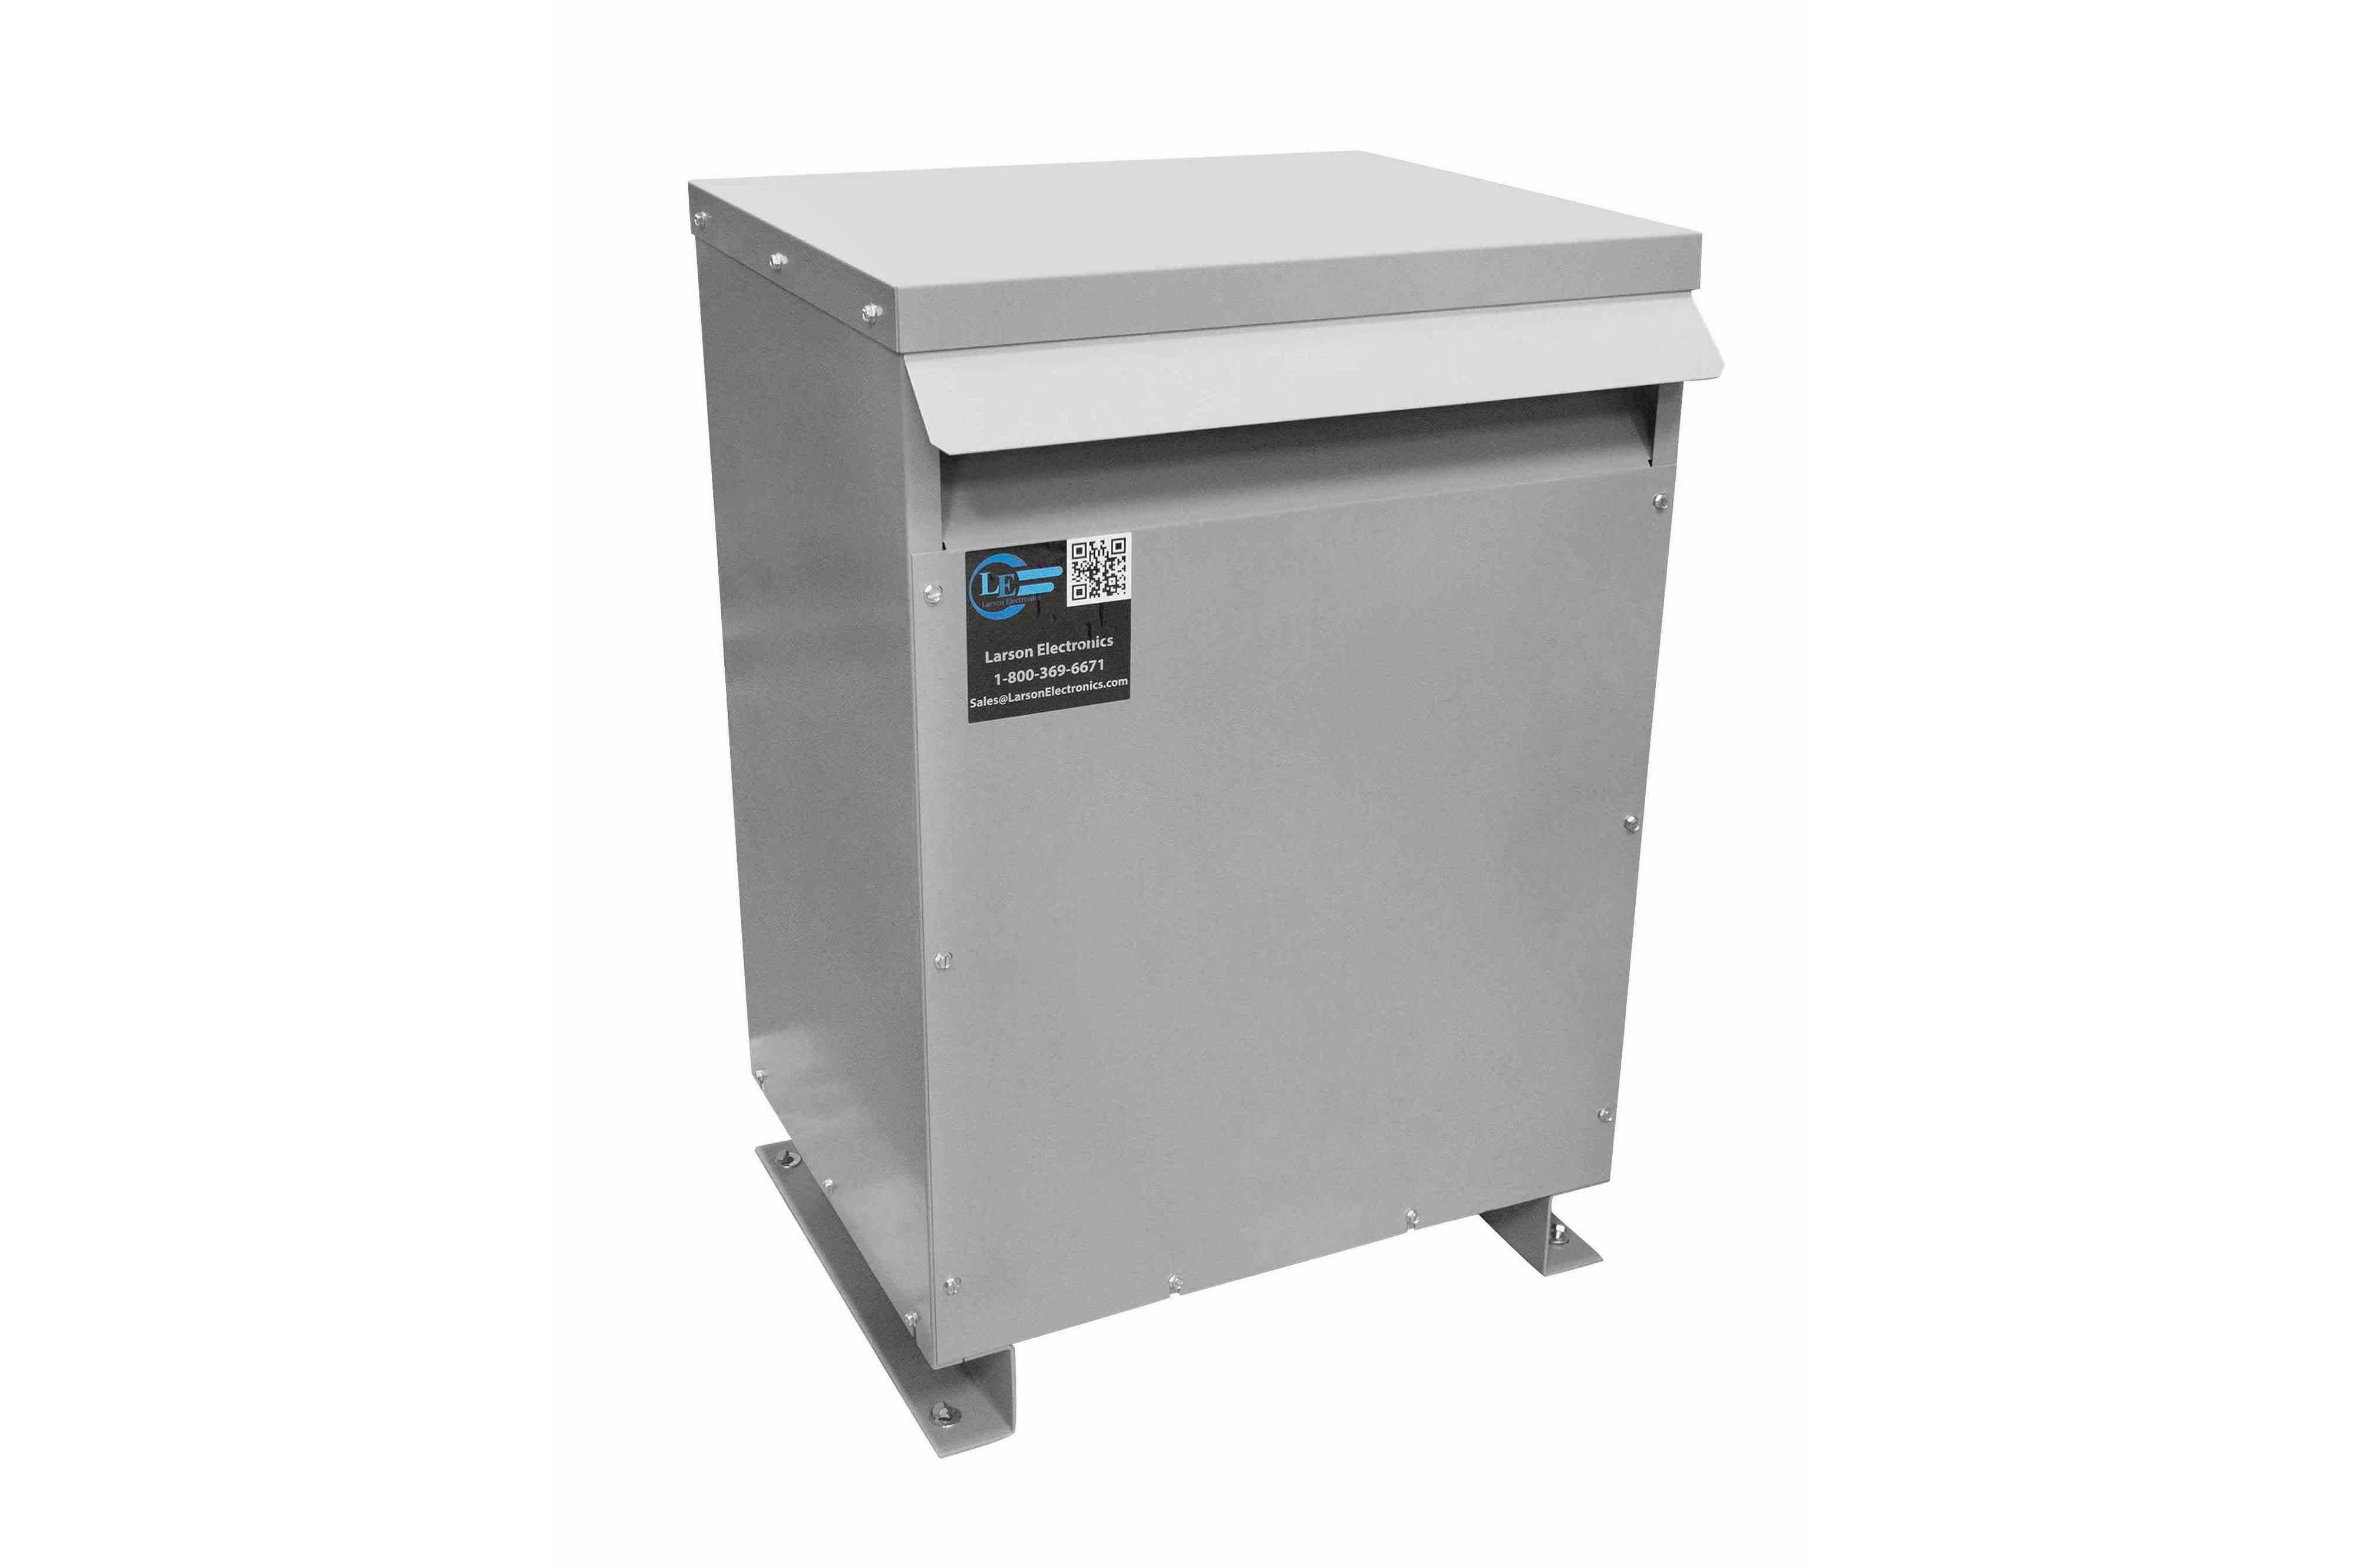 65 kVA 3PH Isolation Transformer, 480V Wye Primary, 600V Delta Secondary, N3R, Ventilated, 60 Hz